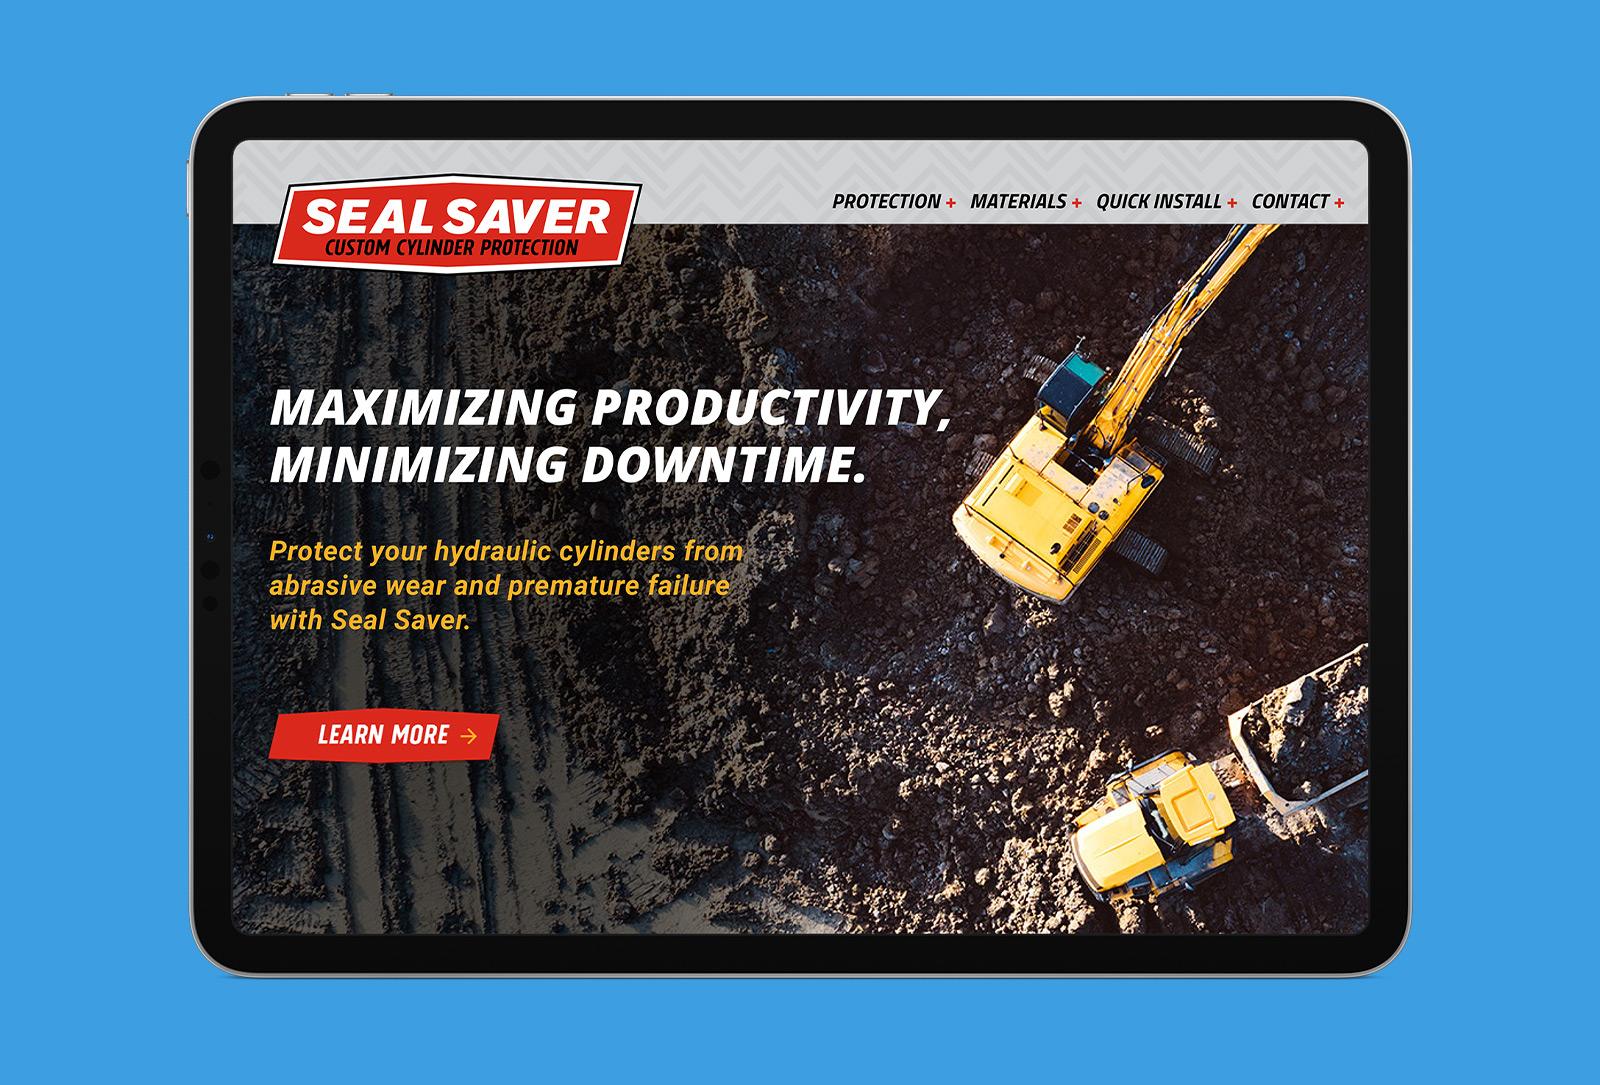 Seal Saver campaign landing page design on tablet